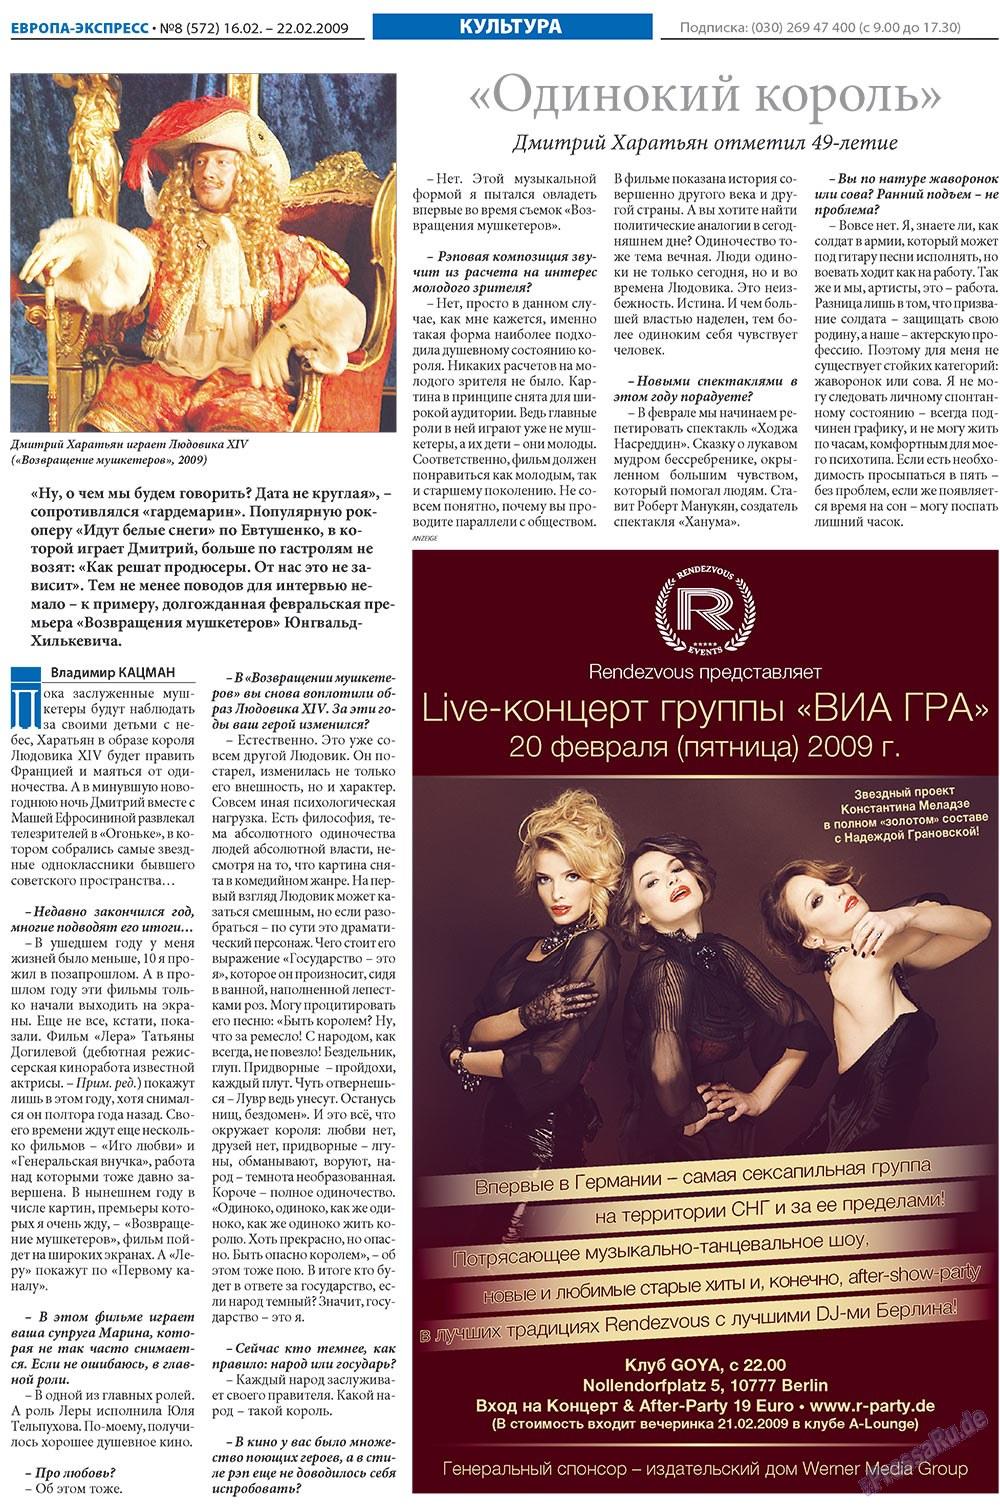 Европа экспресс (газета). 2009 год, номер 8, стр. 18